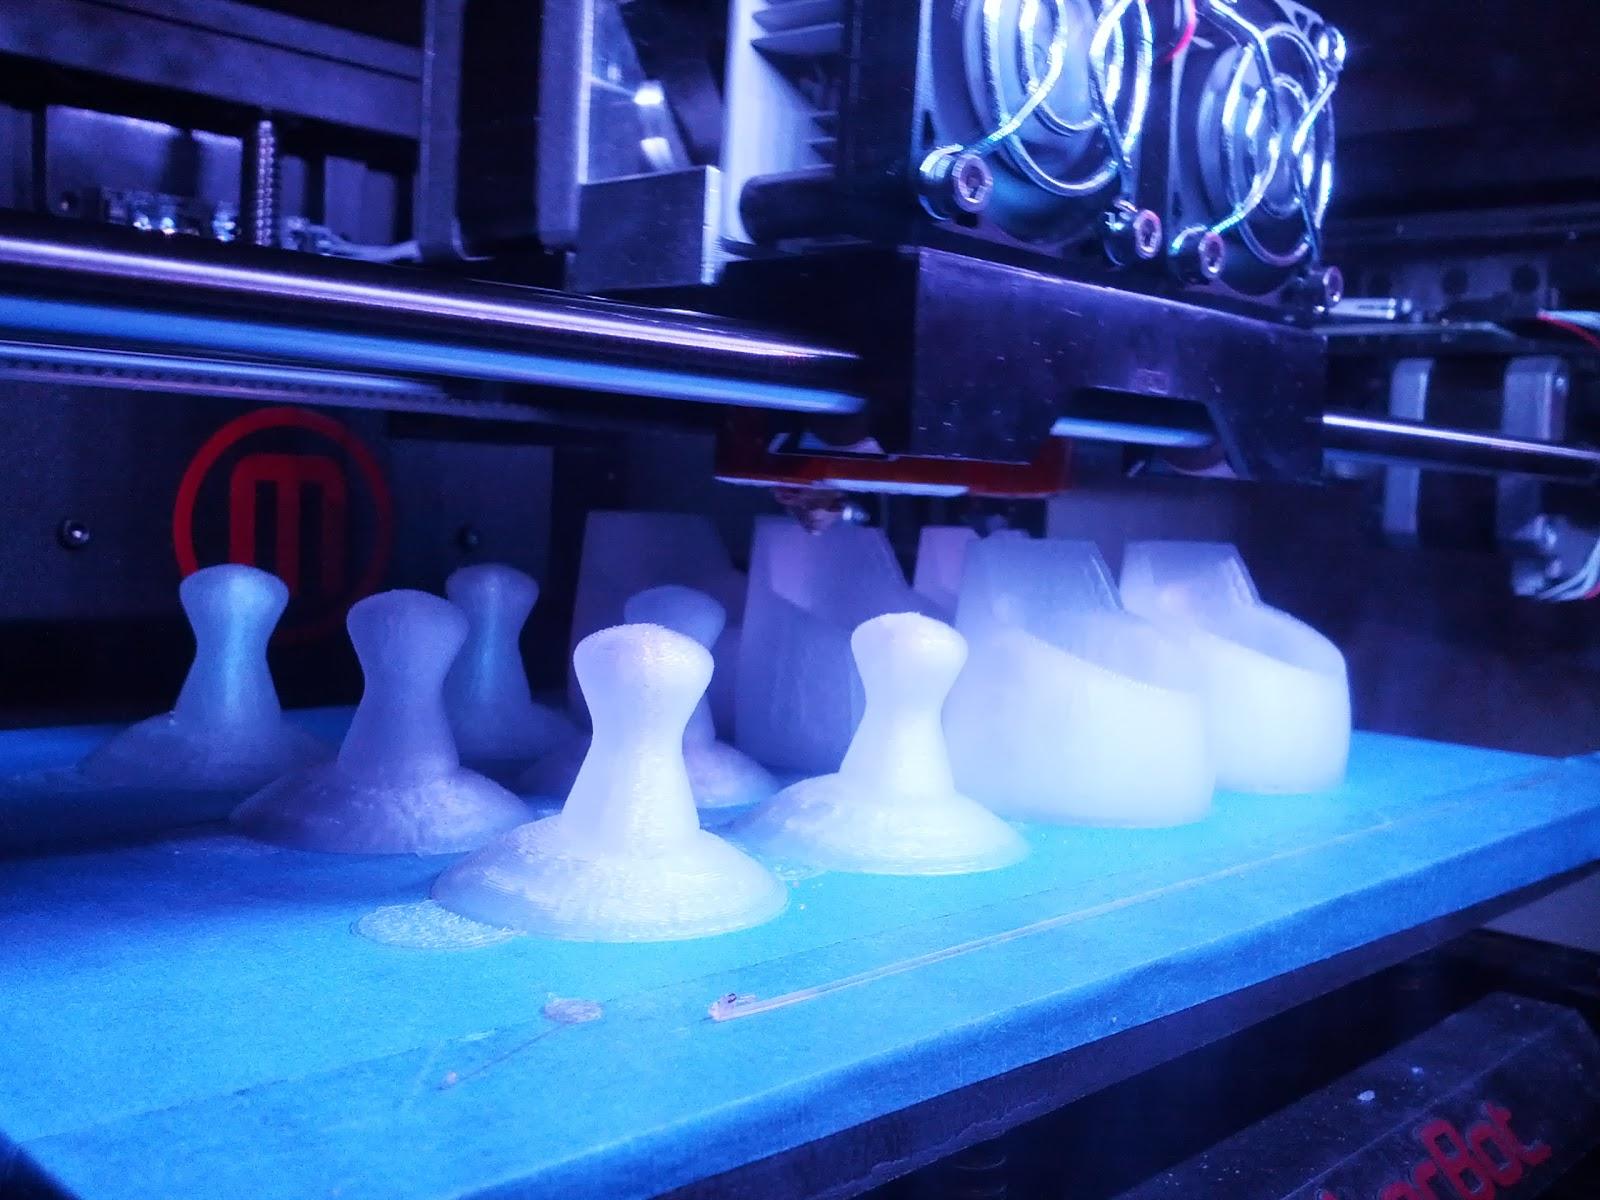 3d Wallpaper Pubg Winner Winner Chicken Dinner Photo Frame: Dbclunie: 3D Print & Video : Multi Scoops! (5hrs @ 200